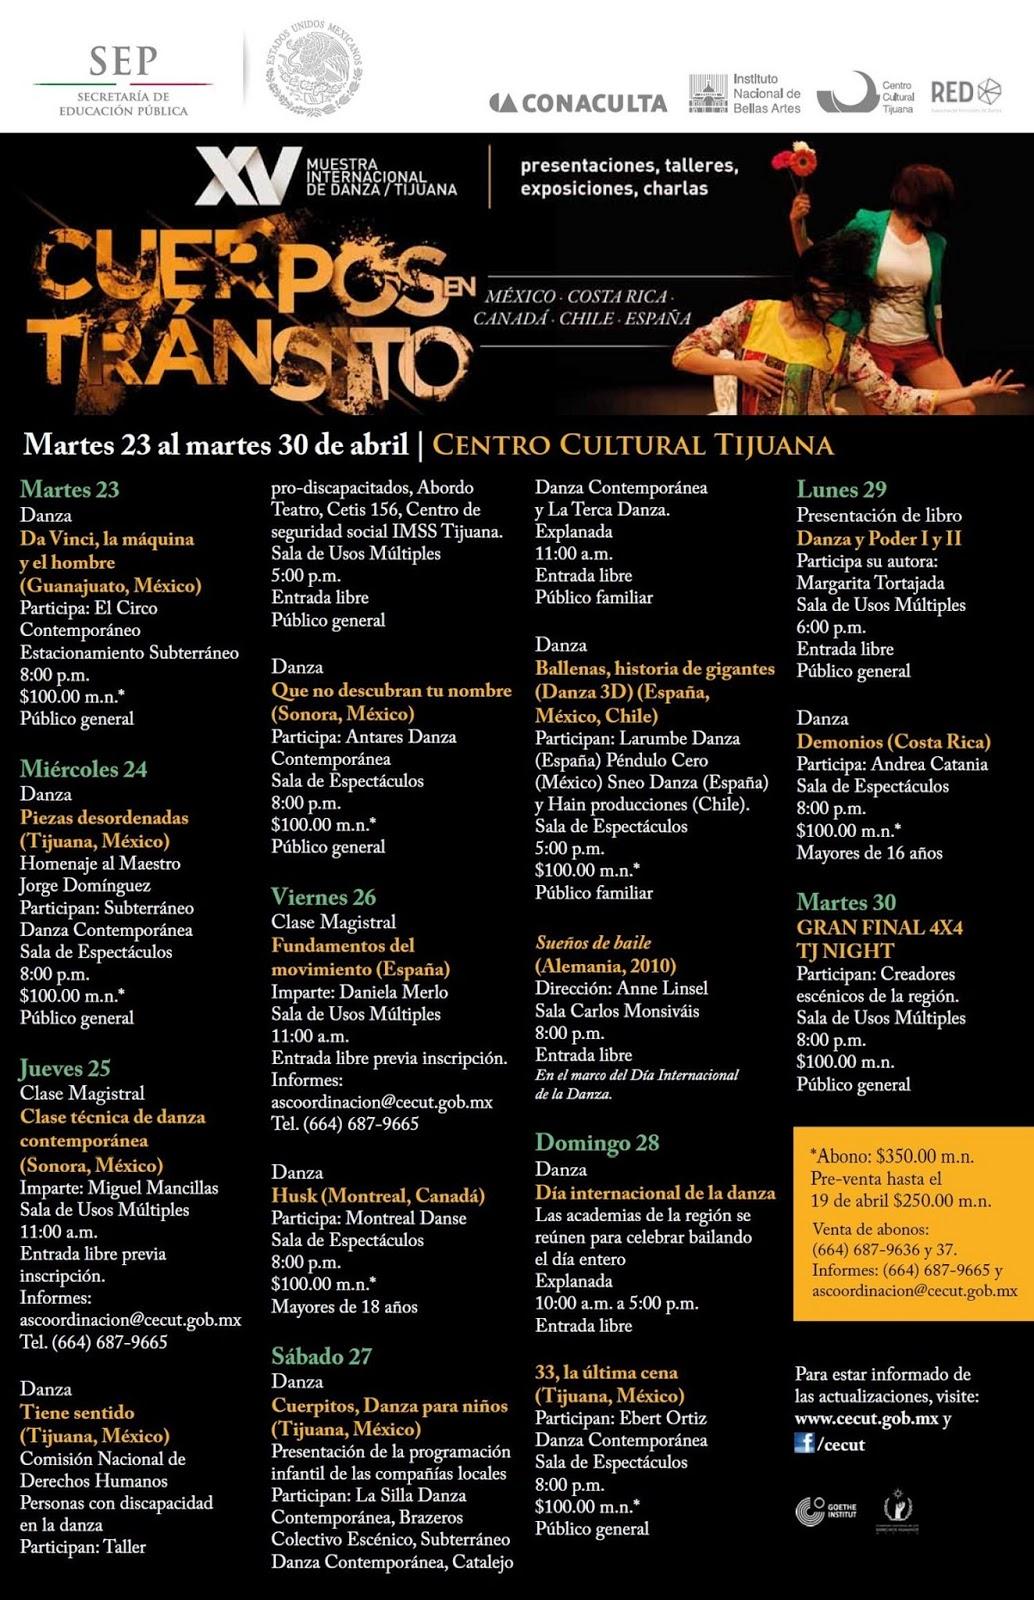 Centro Cultural Tijuana - CECUT: abril 2013